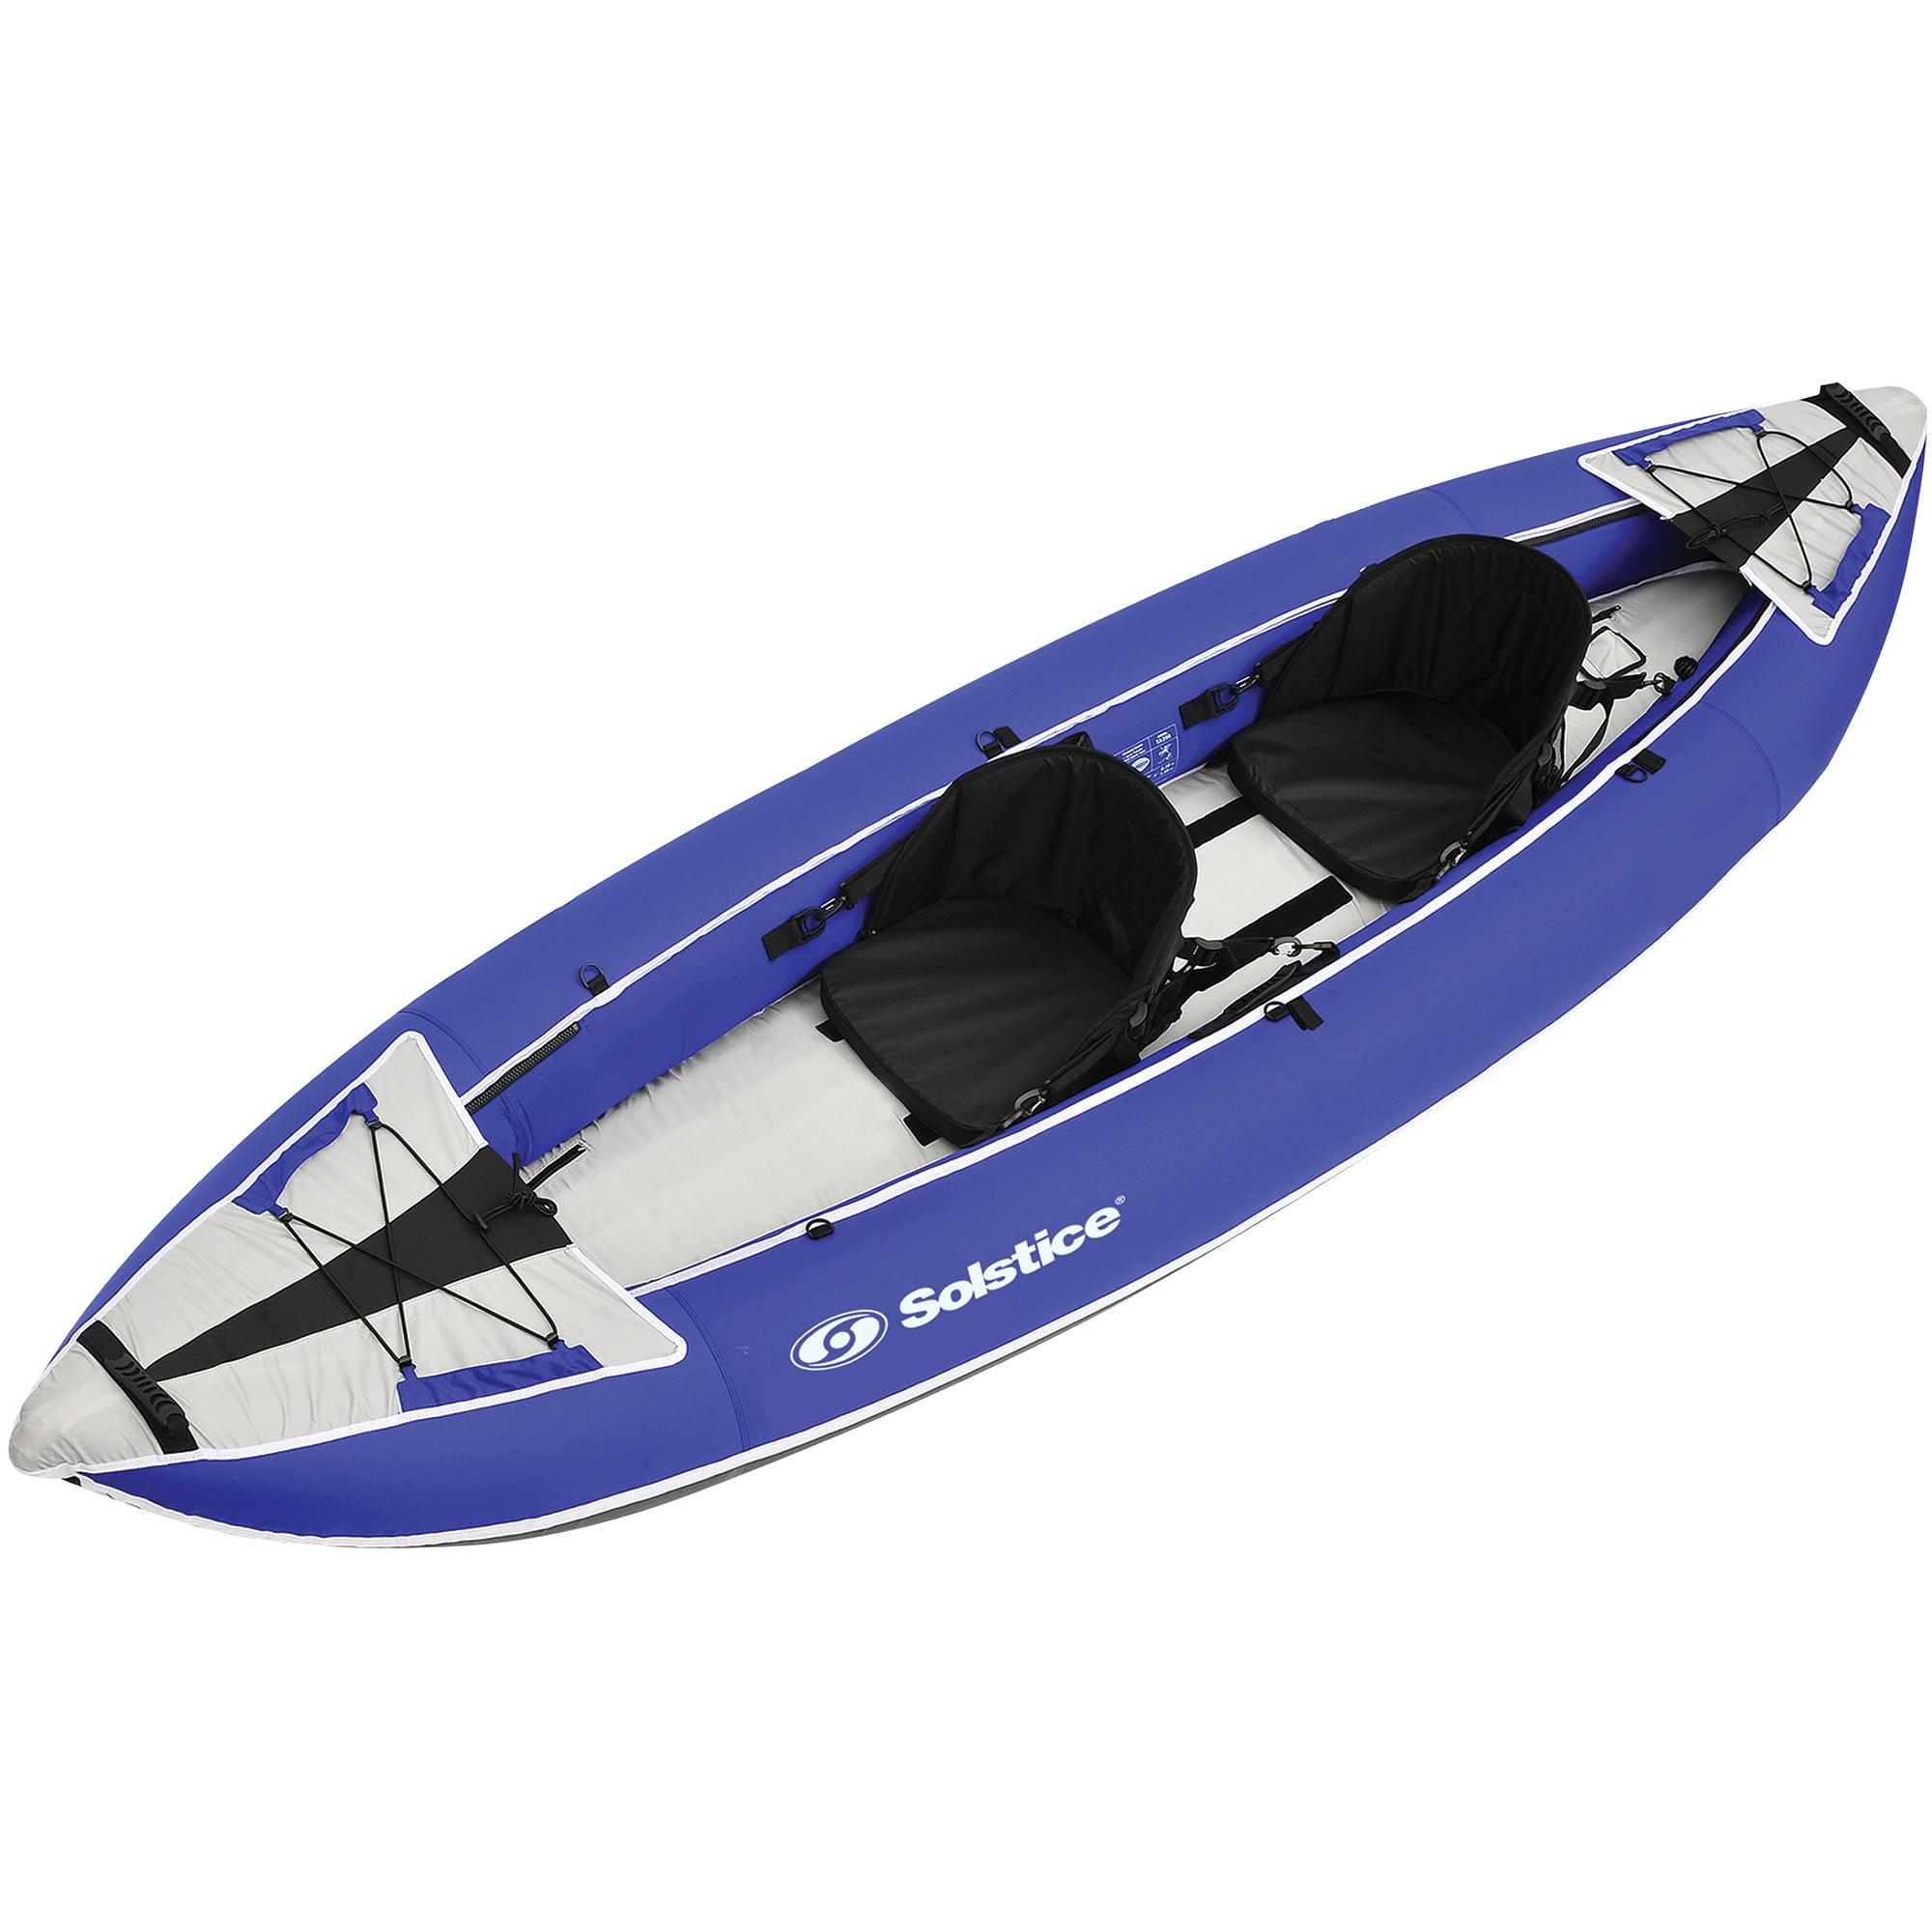 Solstice Durango Kayak by International Leisure